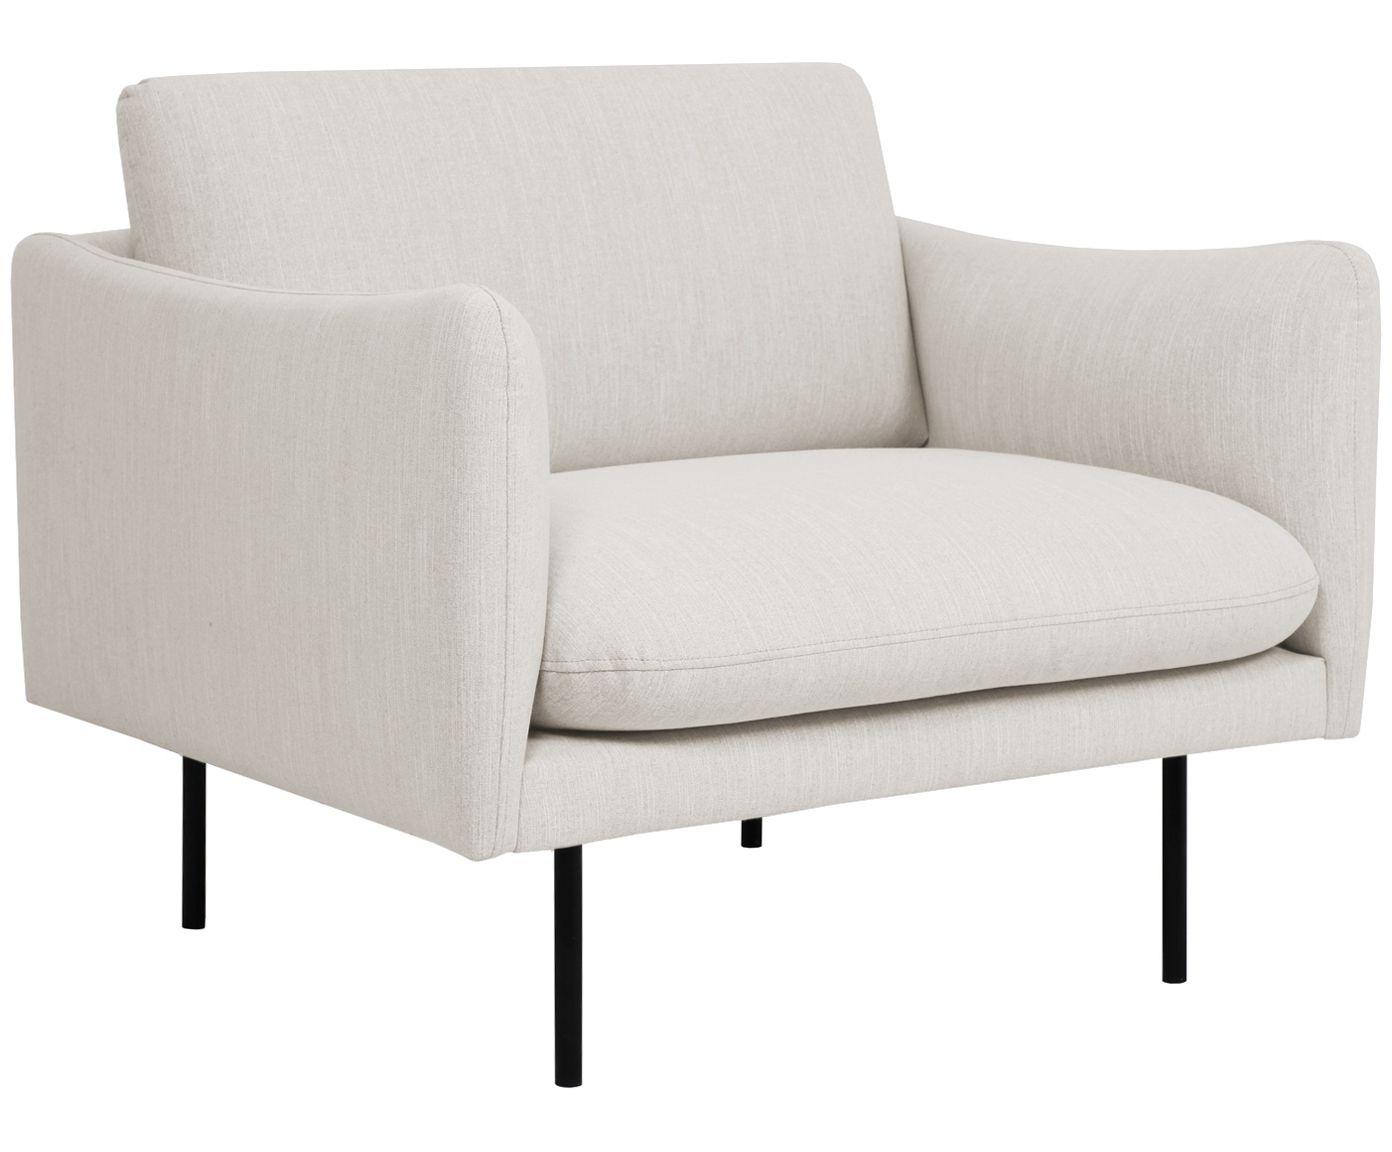 Sessel Moby Sessel Sessel Kaufen Und Grosses Sofa